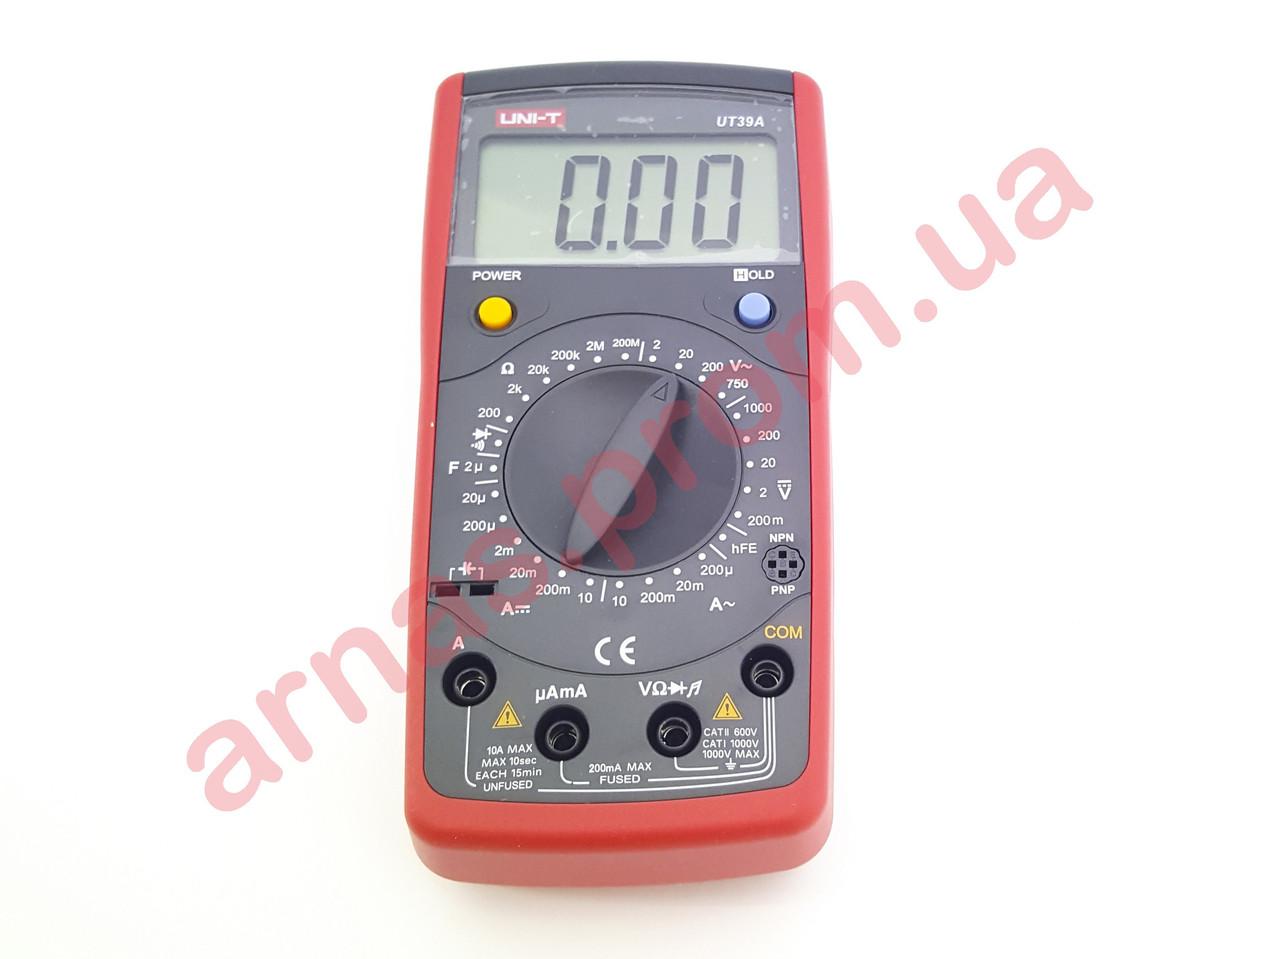 Мультиметр Uni-t UT39A цифровой